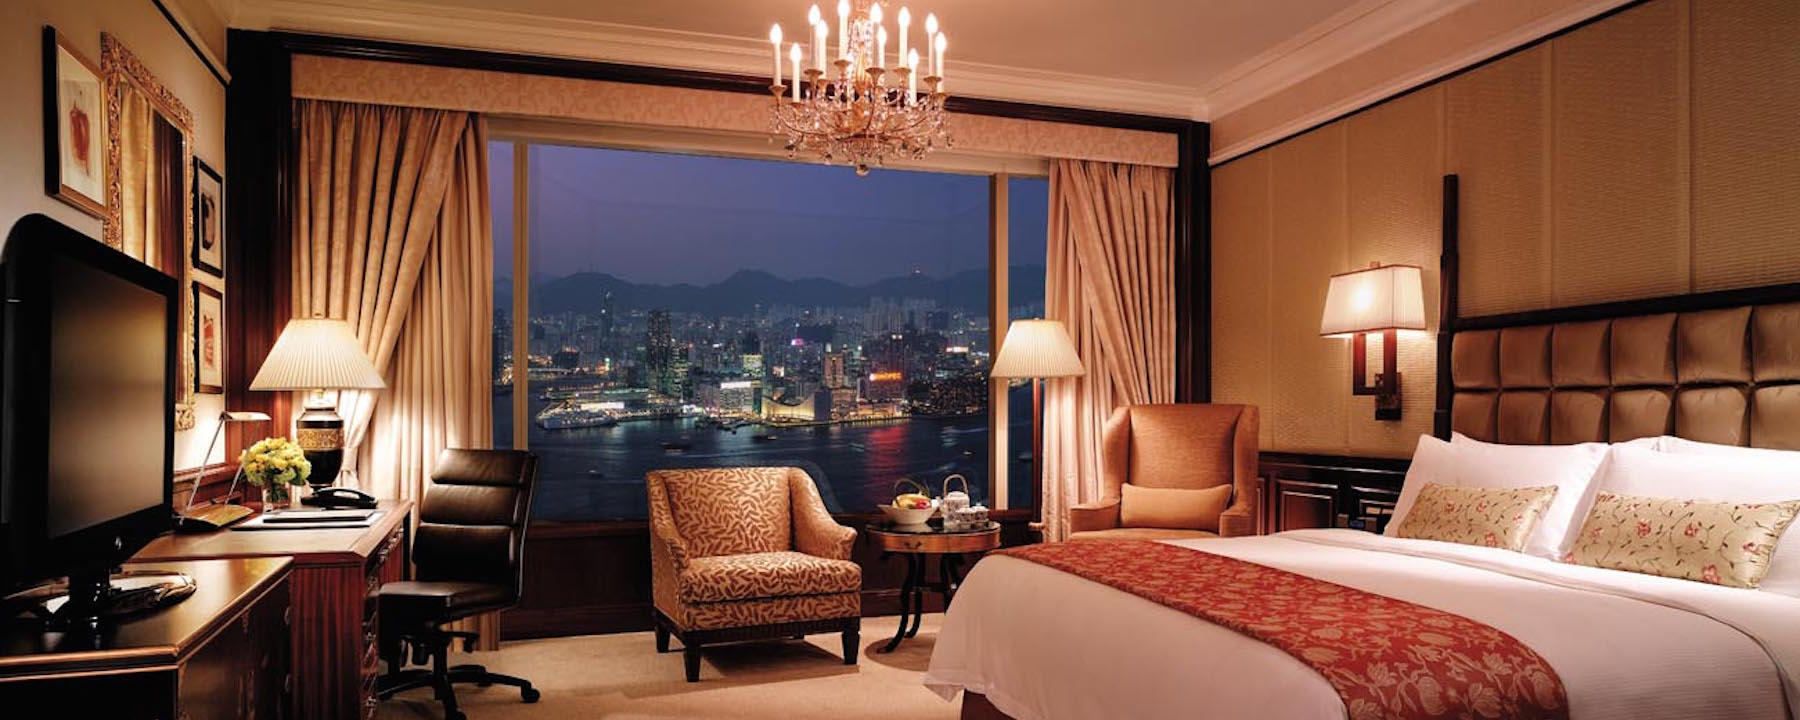 Island Shangri La Hong Kong Ideal 5 Star Hotel For Leisure Weddings Business